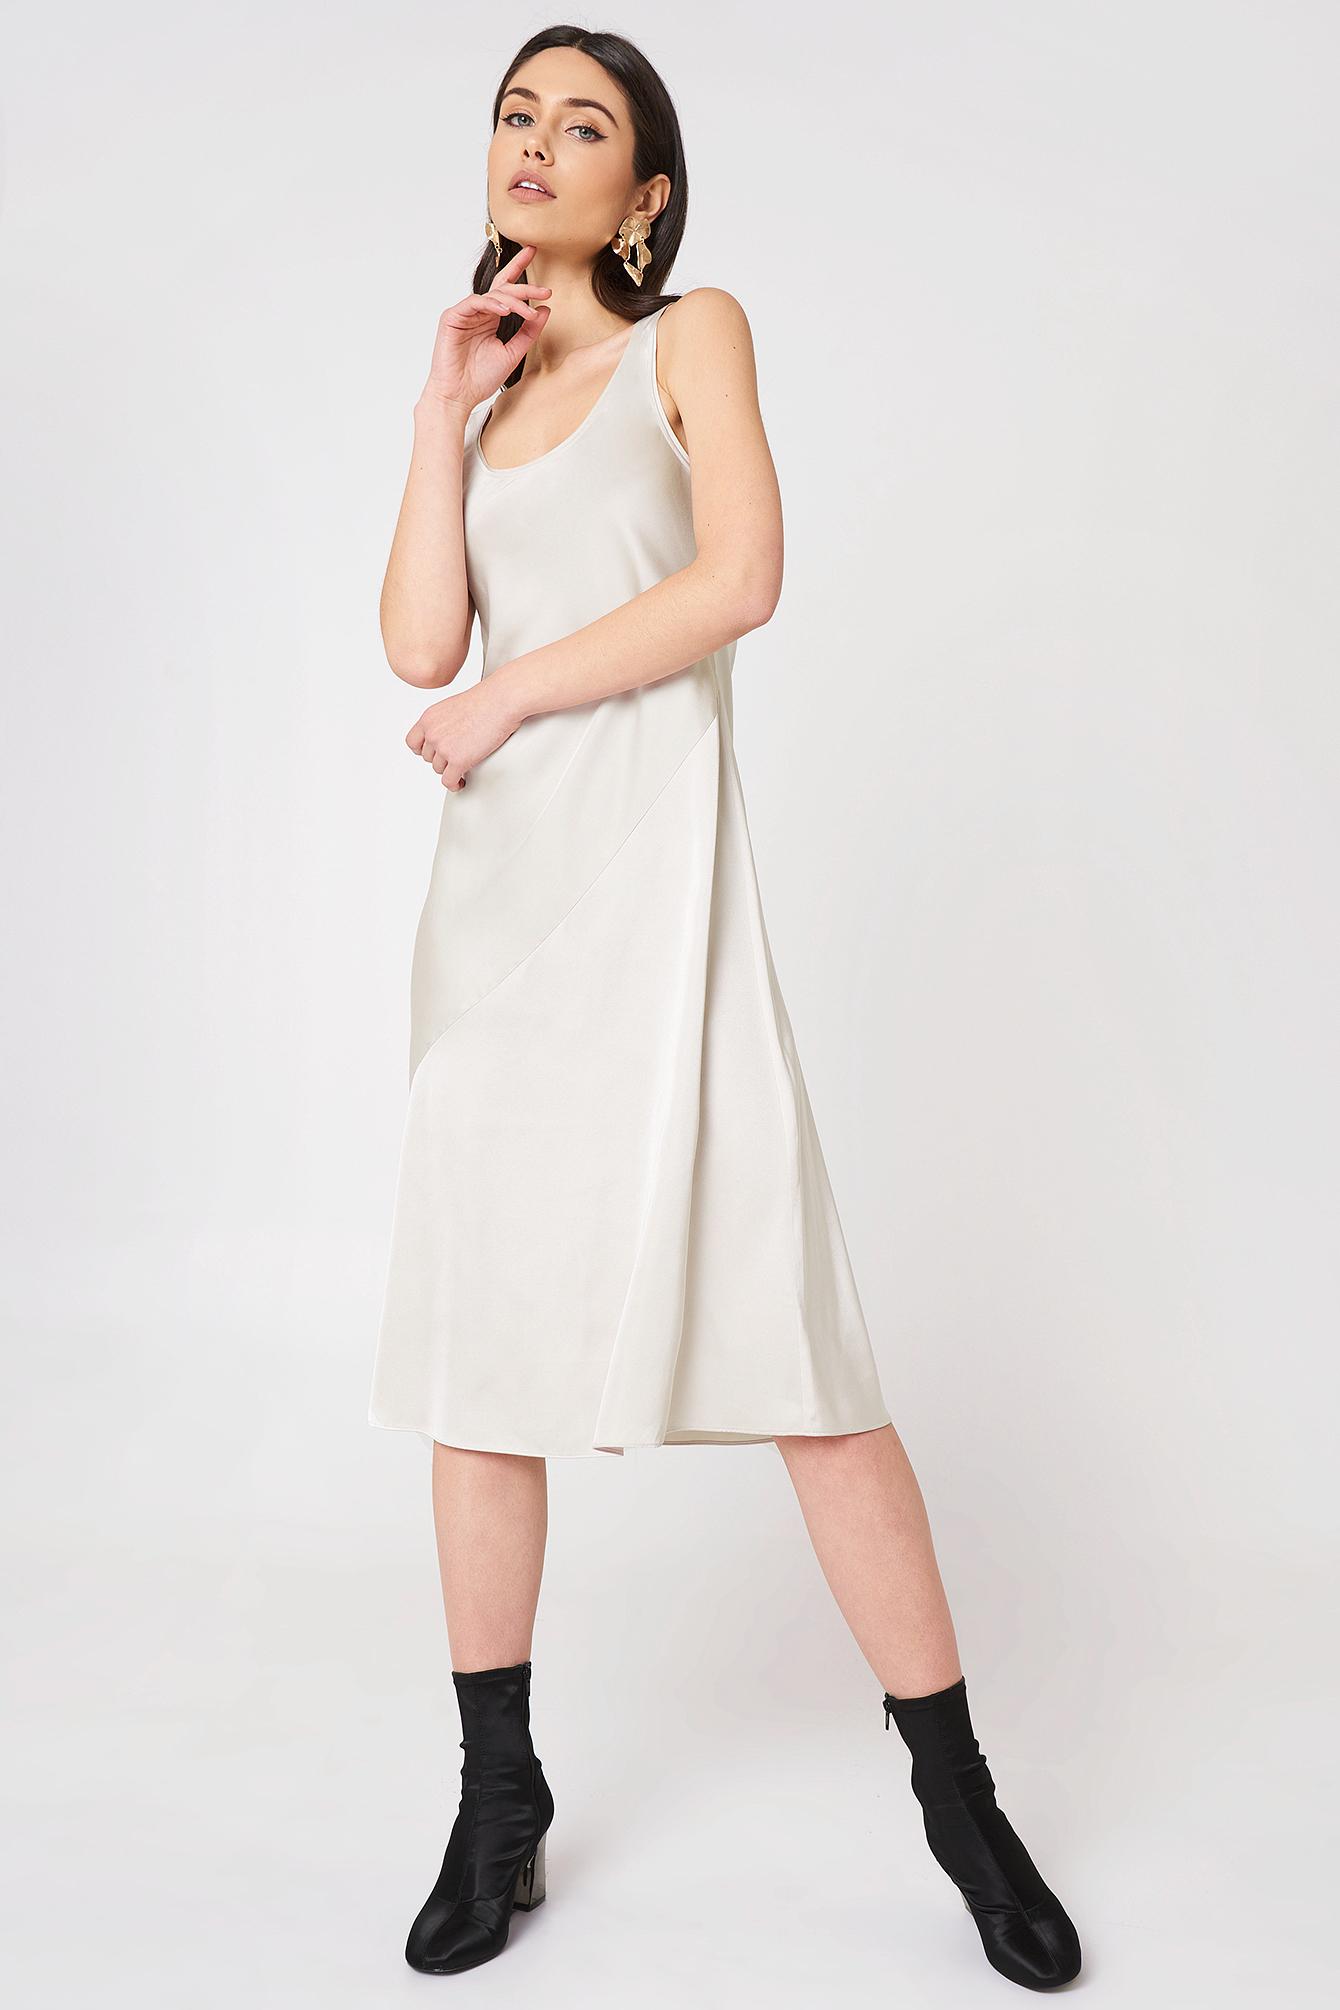 Slinky Tank Dress NA-KD.COM. 29. USD 225.95. Filippa K